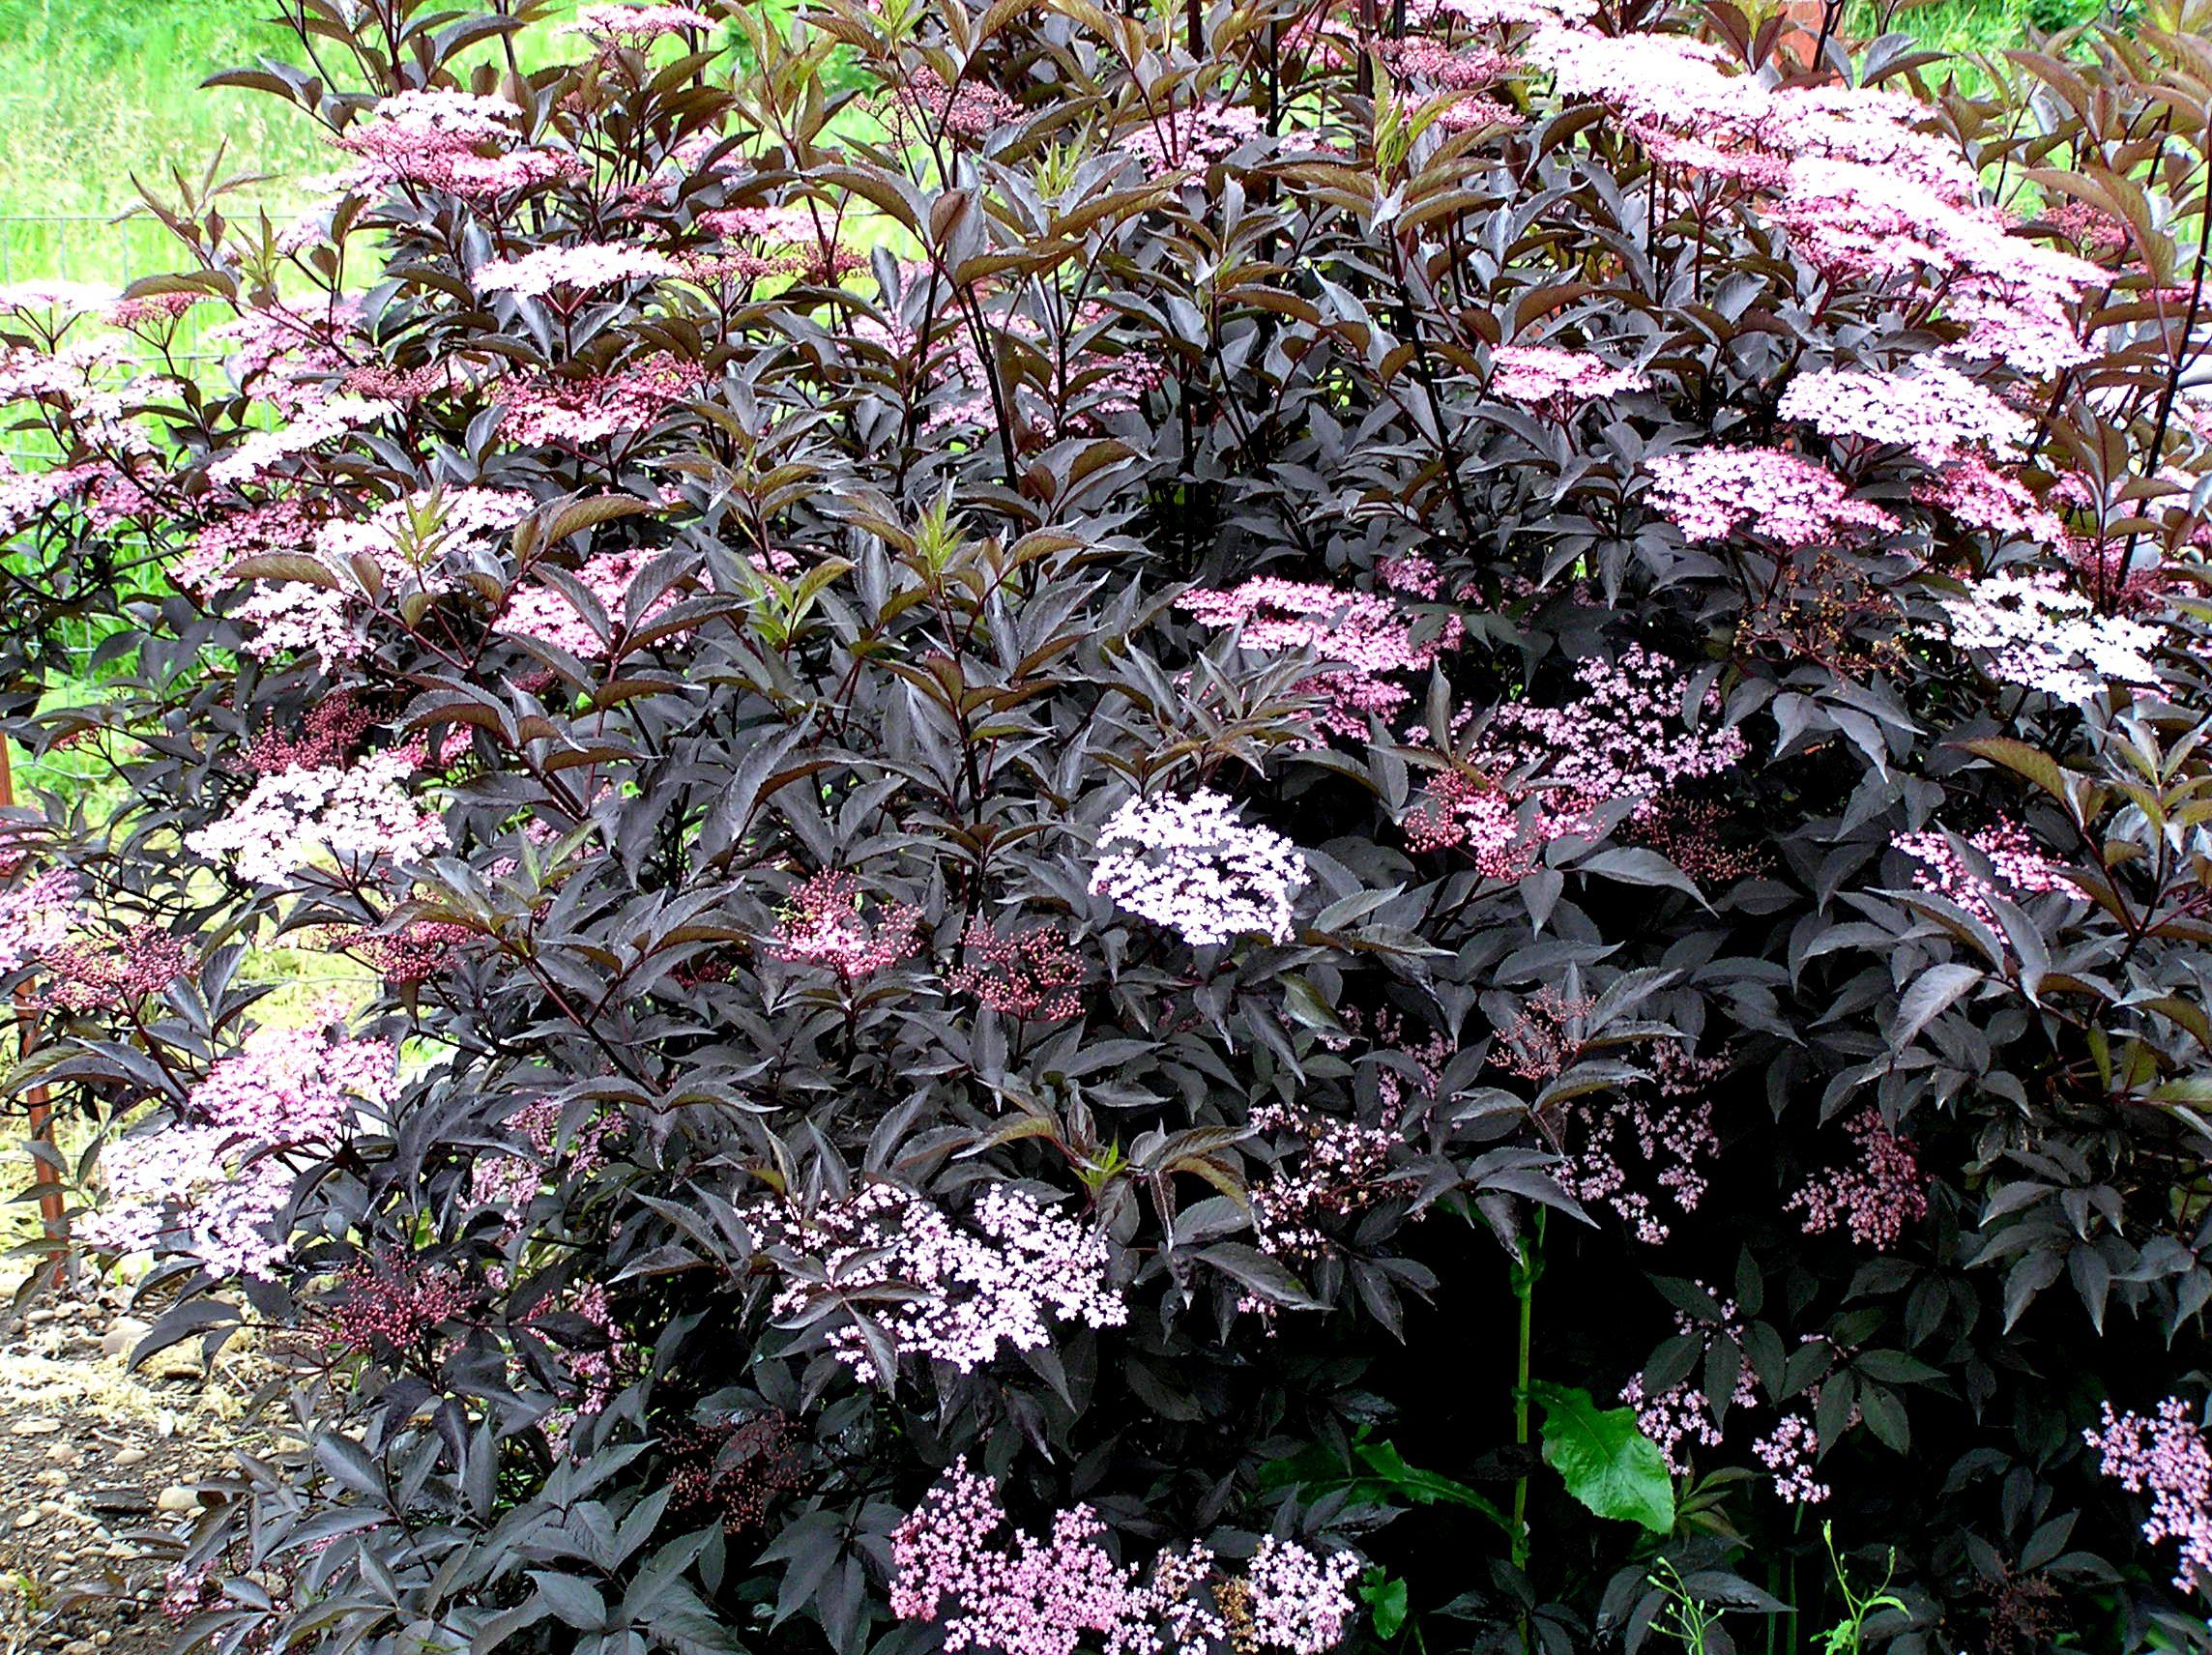 Sambucus Black Beauty (Elderberry)  Edible Flowers And Berries